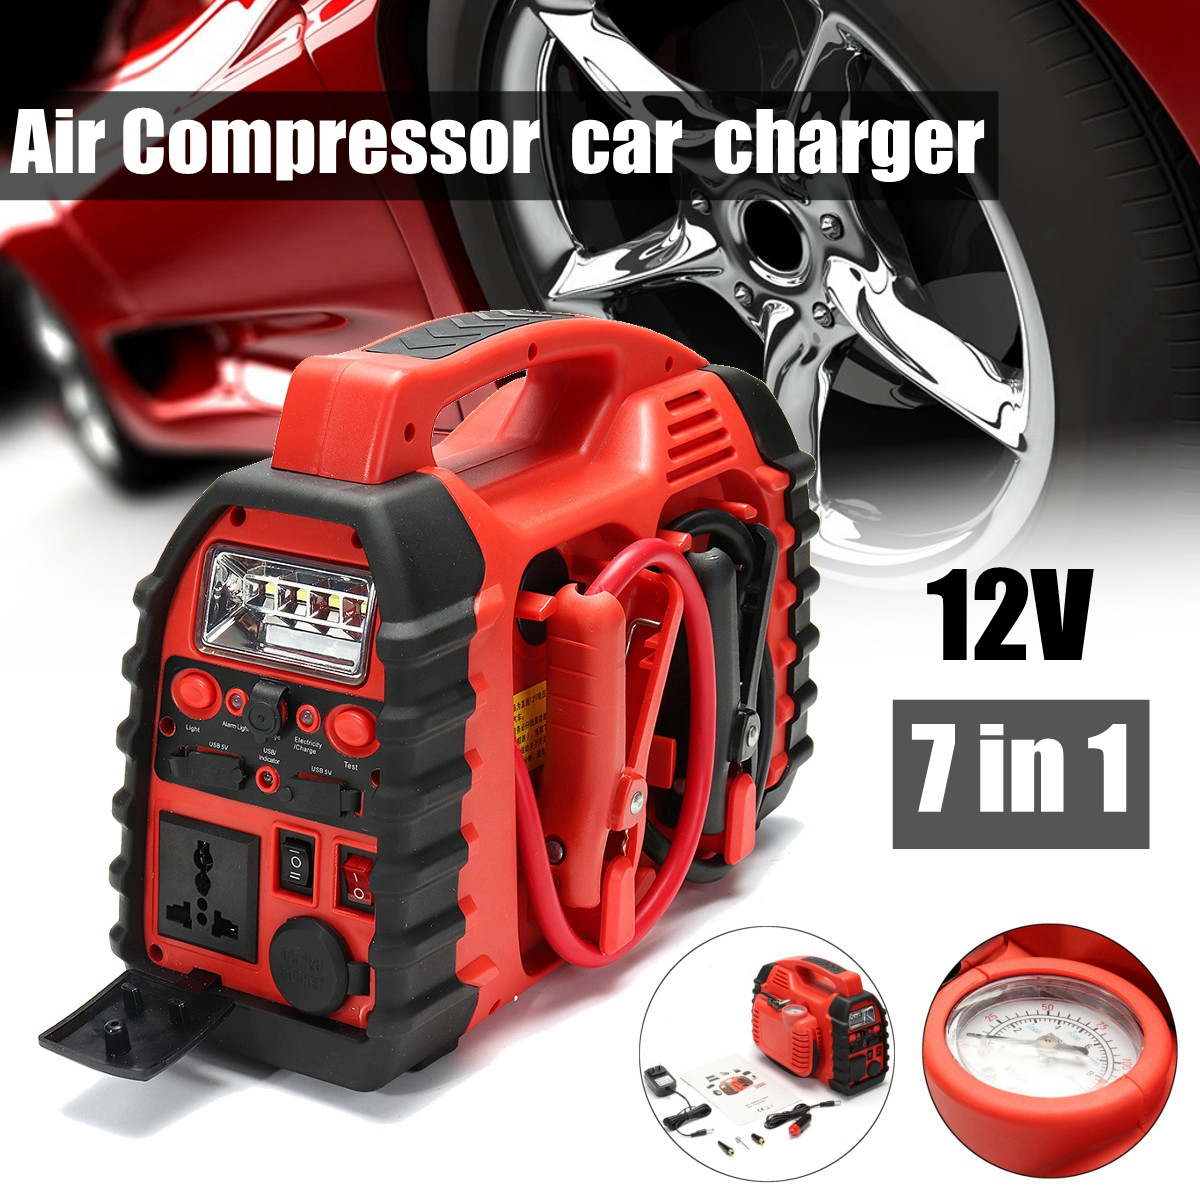 7 In 1/ 6 In 1 12V Multifunation Air Compressor Air Compressor Car Charger Battery Jump Starter Portable Boost hammer starter refrigerator freezer compressor starter 1 2hp 1 3hp 1 4hp 1 5hp 1 6hp or with capacitor pin